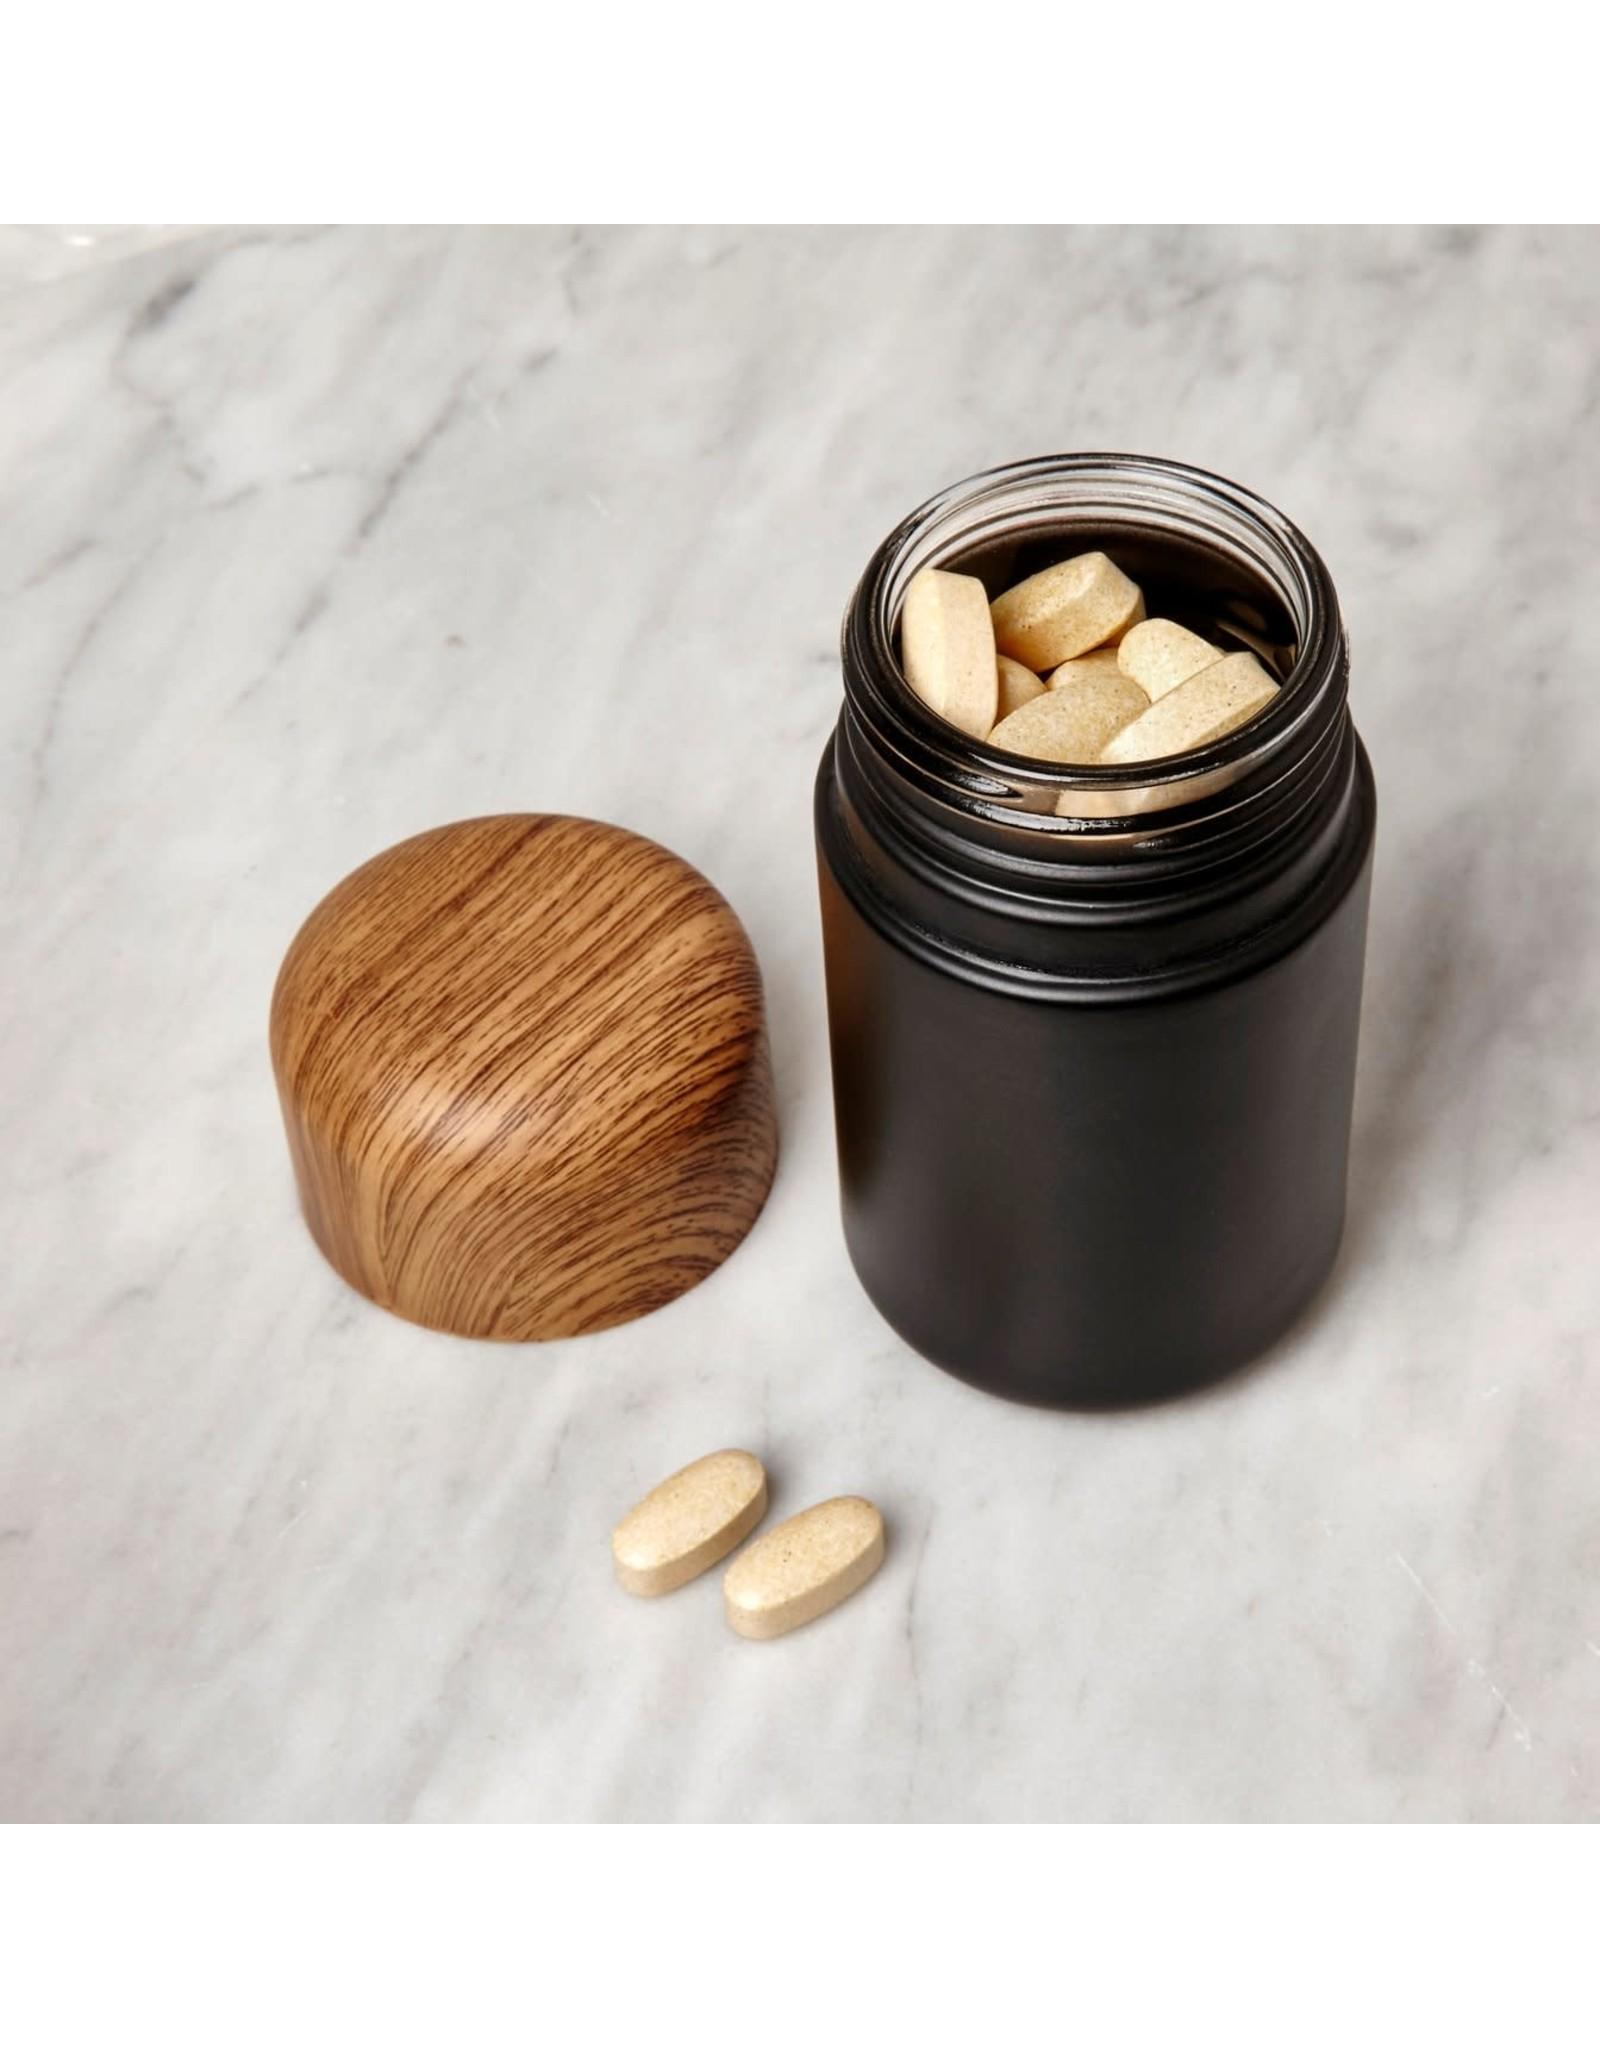 KIK Large Childproof Stash Jar in Black